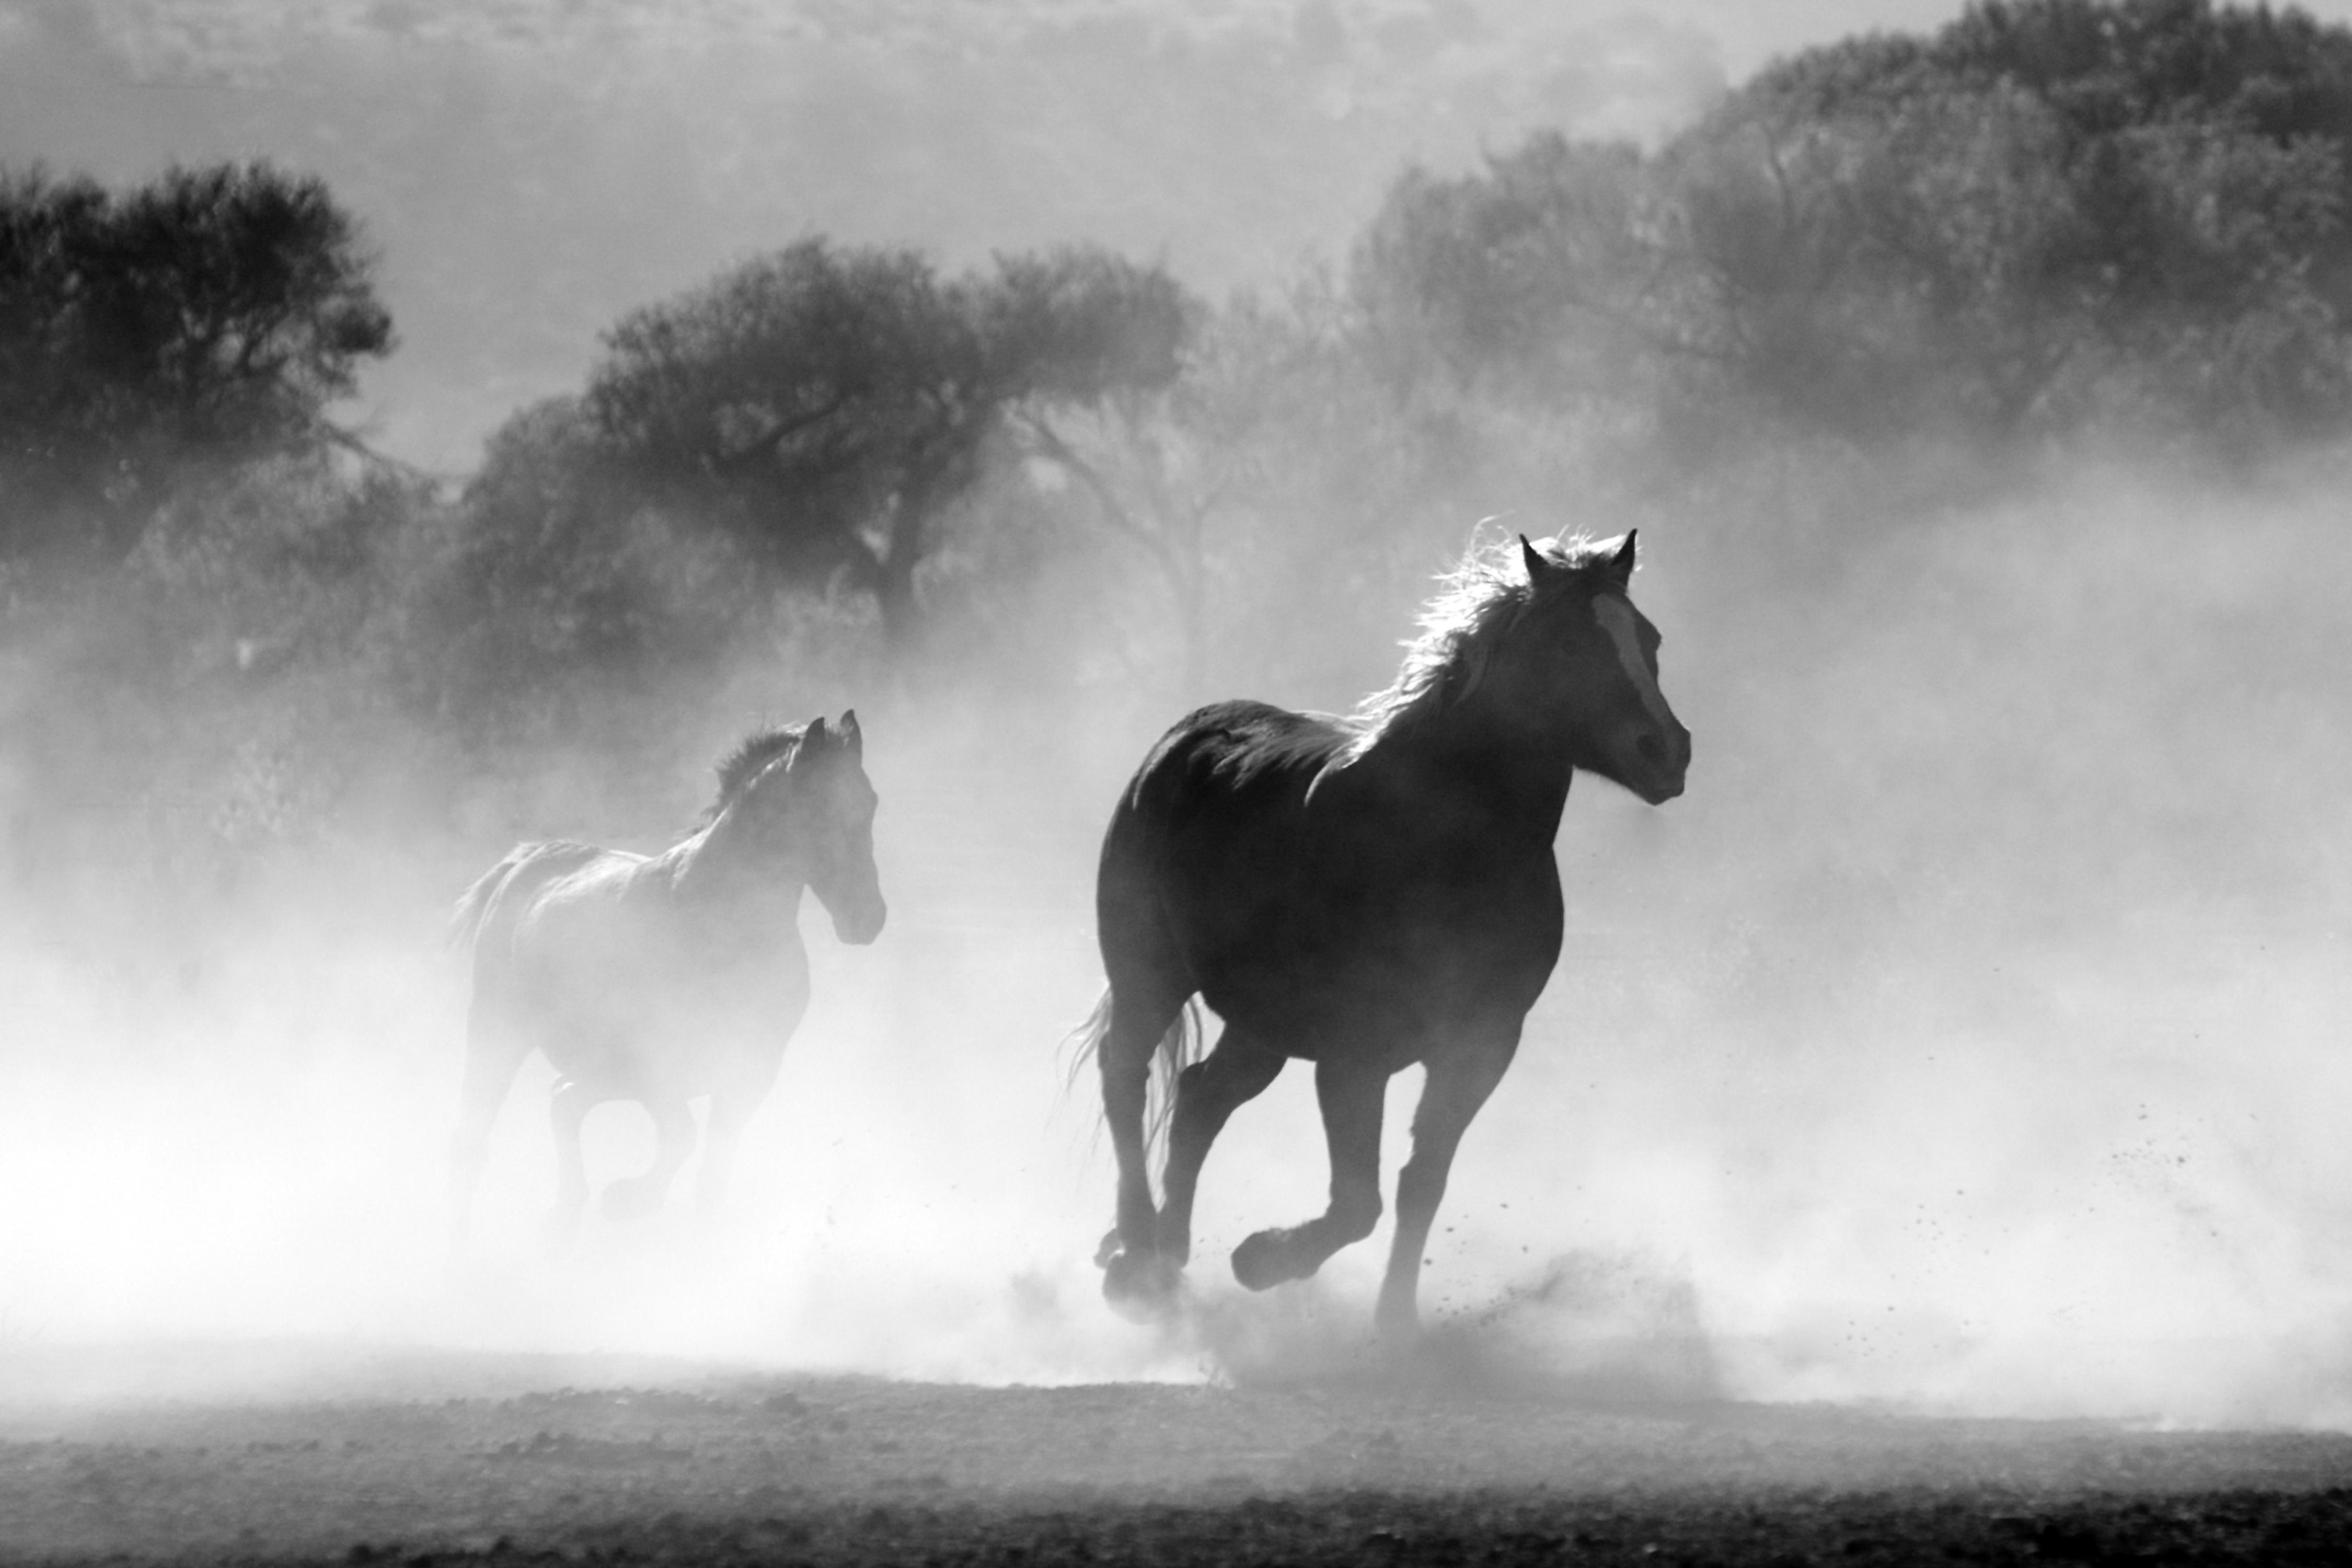 free images nature black and white fog mist animal motion